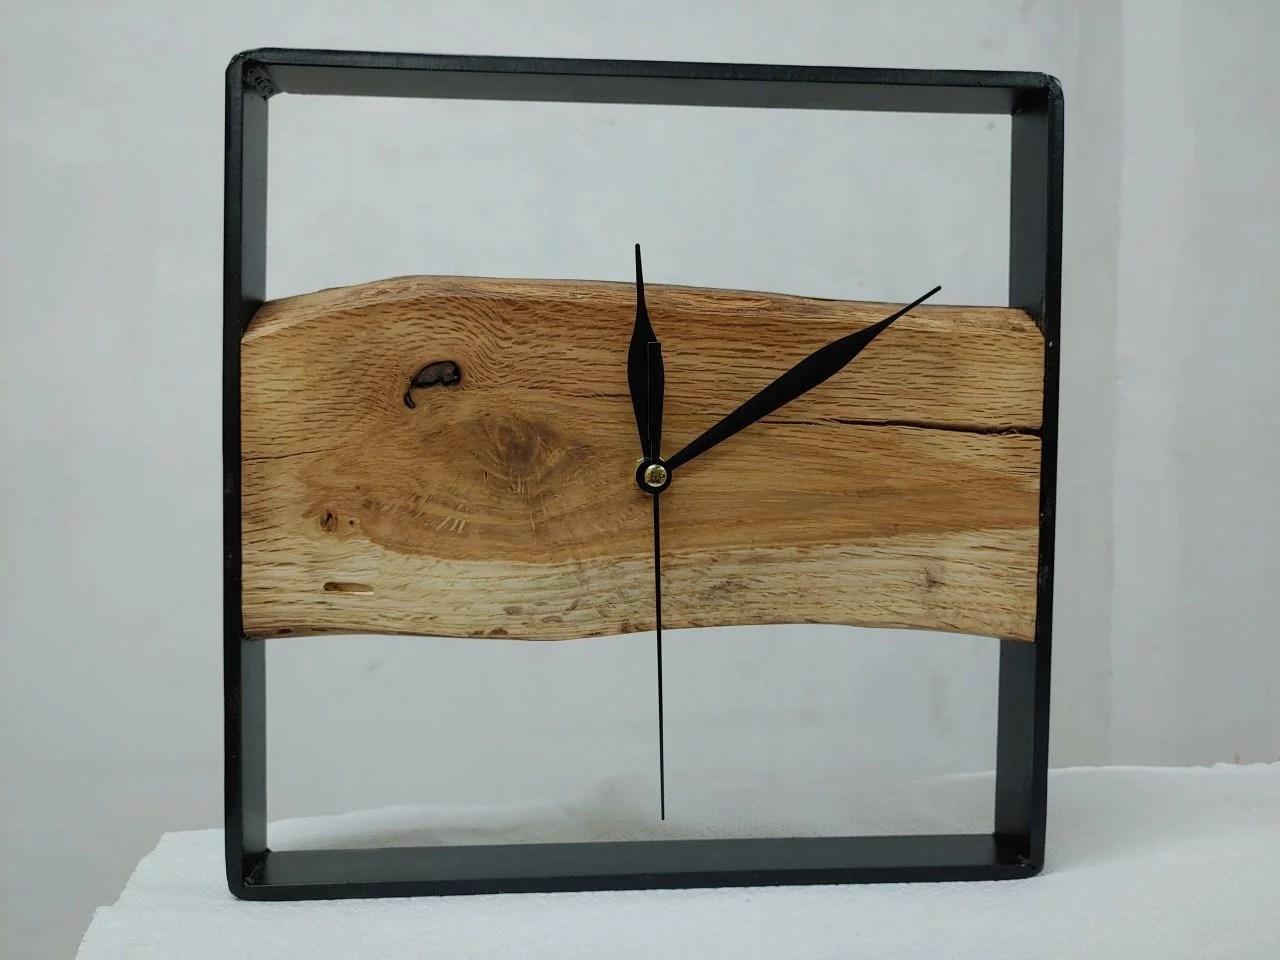 Designové hodiny kov a dřevo post thumbnail